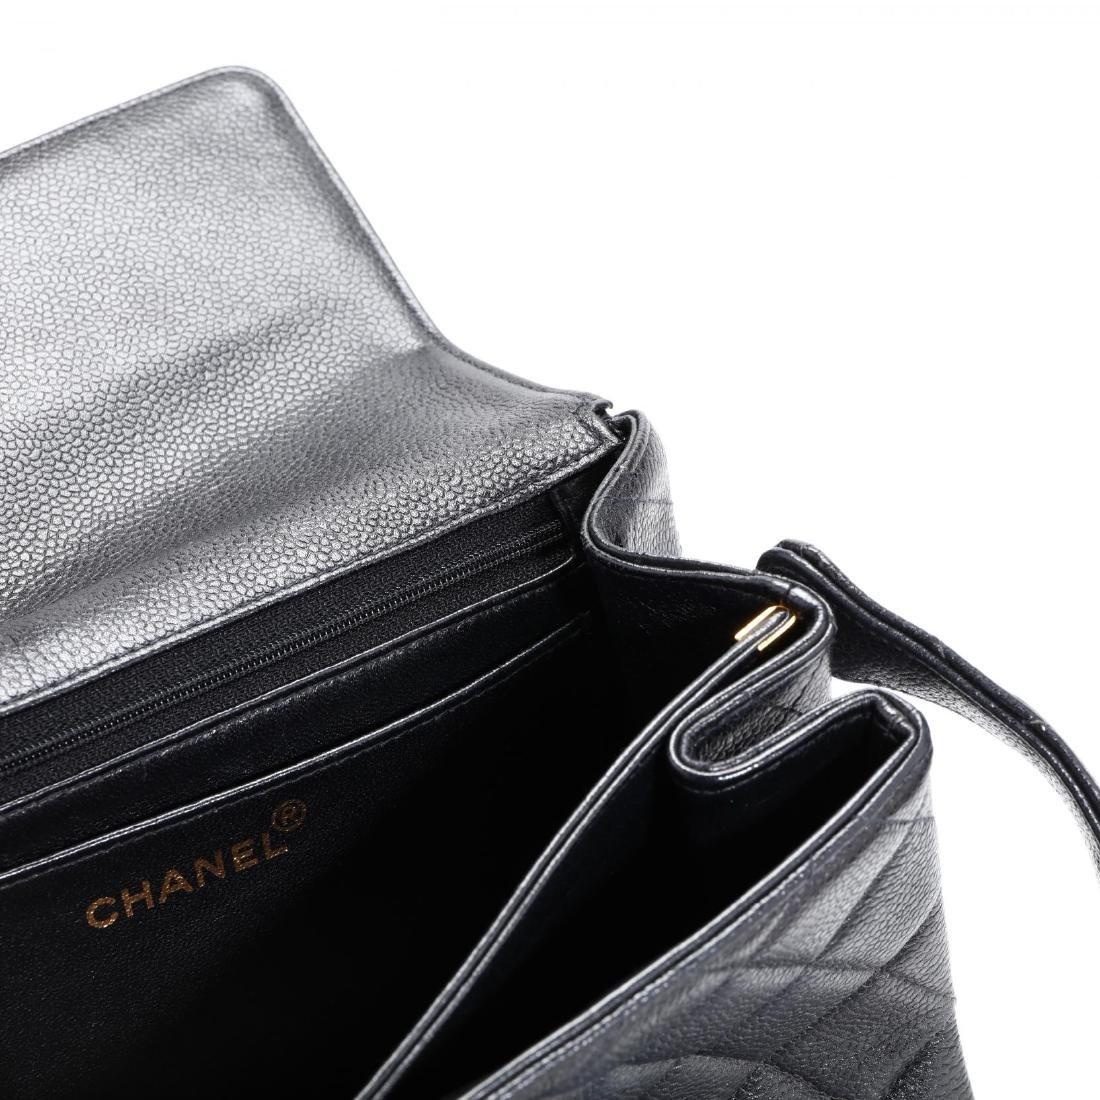 Caviar Leather Trapeze Flap Handbag, Chanel - 9